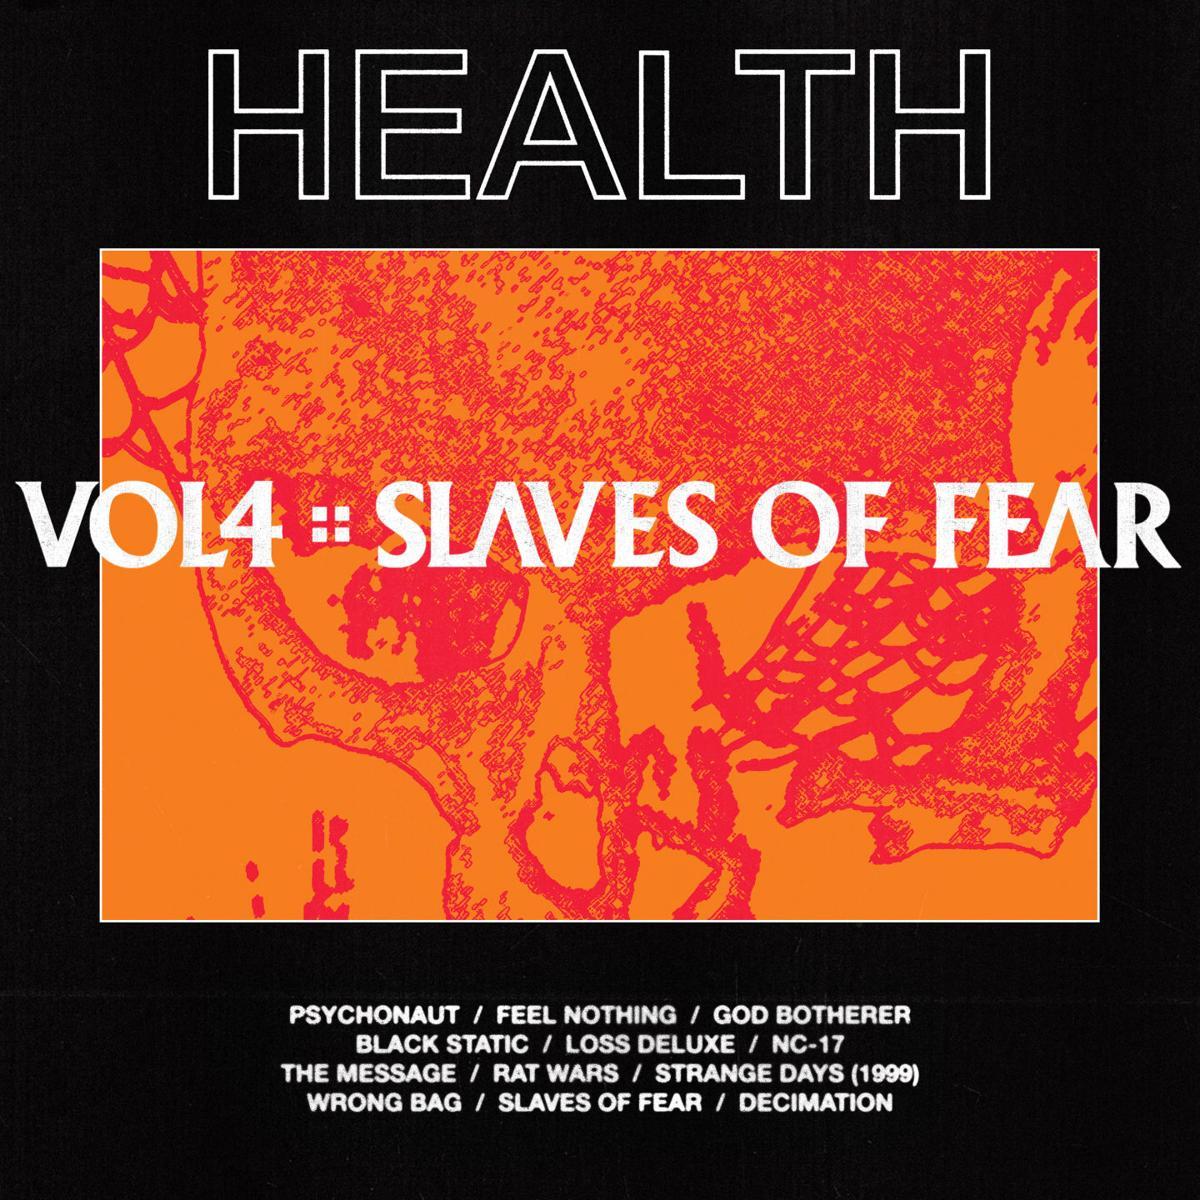 Noise rock band HEALTH talks new album, reality's 'lame